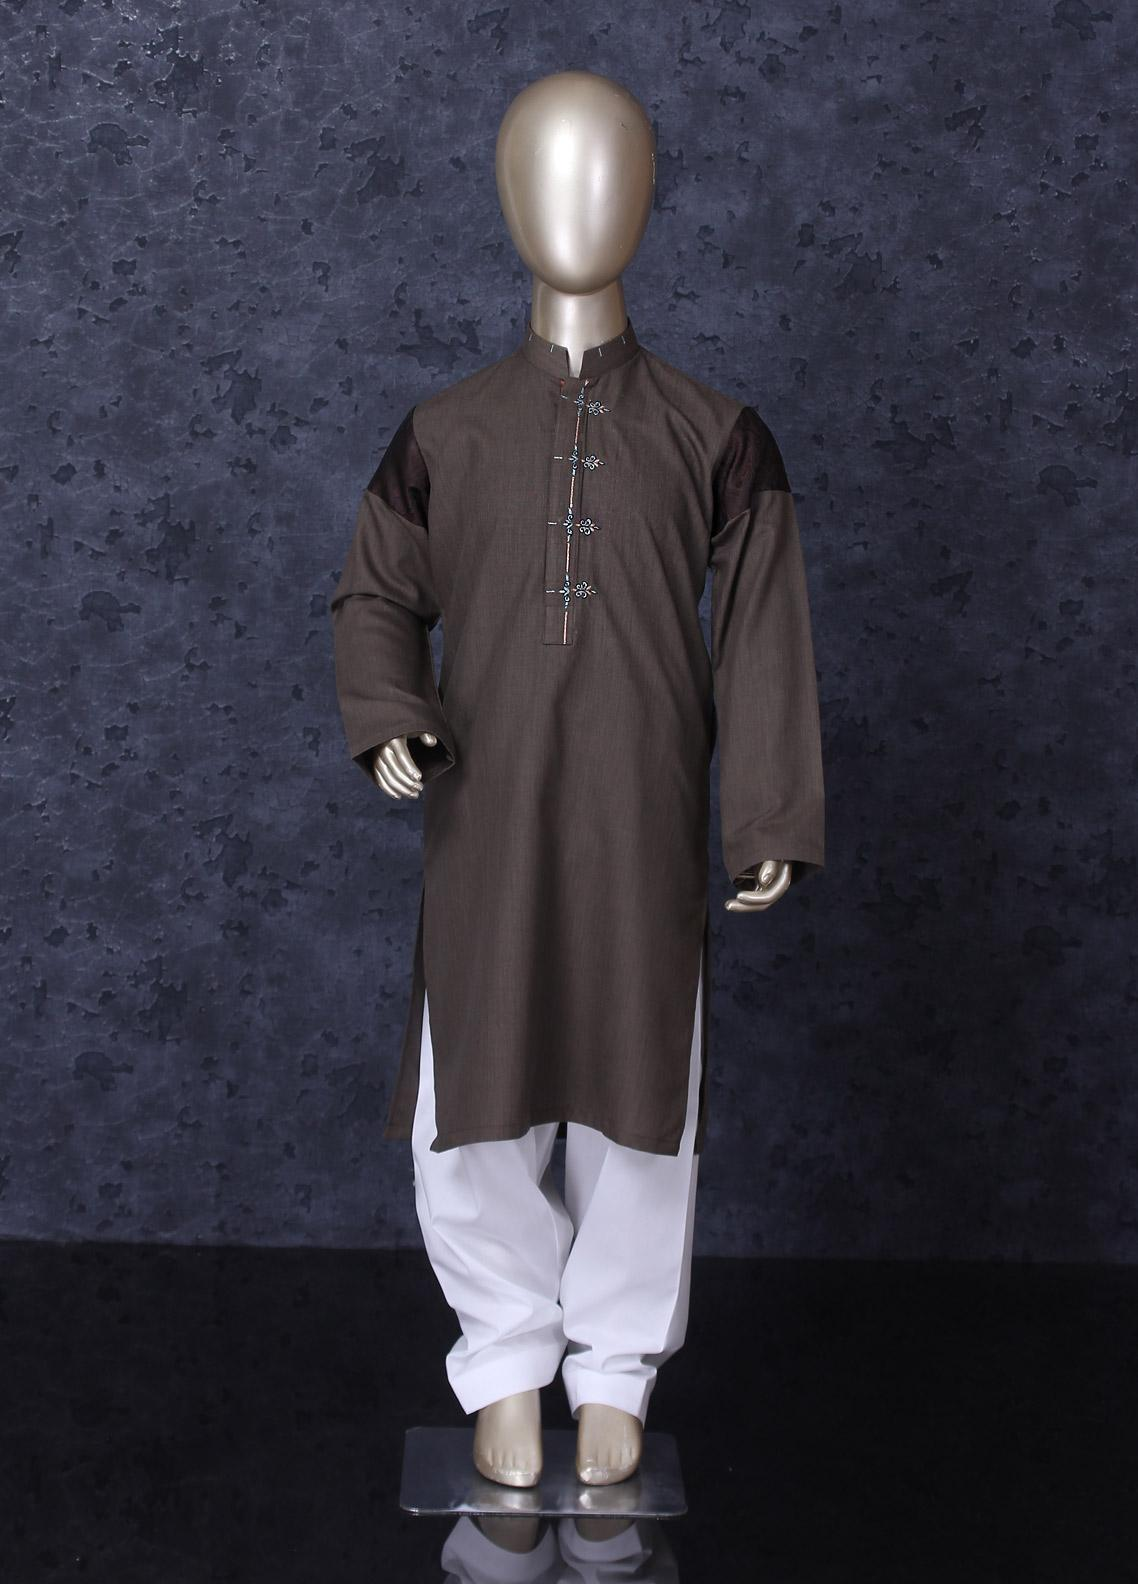 Aizaz Zafar Cotton Formal Kameez Shalwar for Boys -  247 Brown